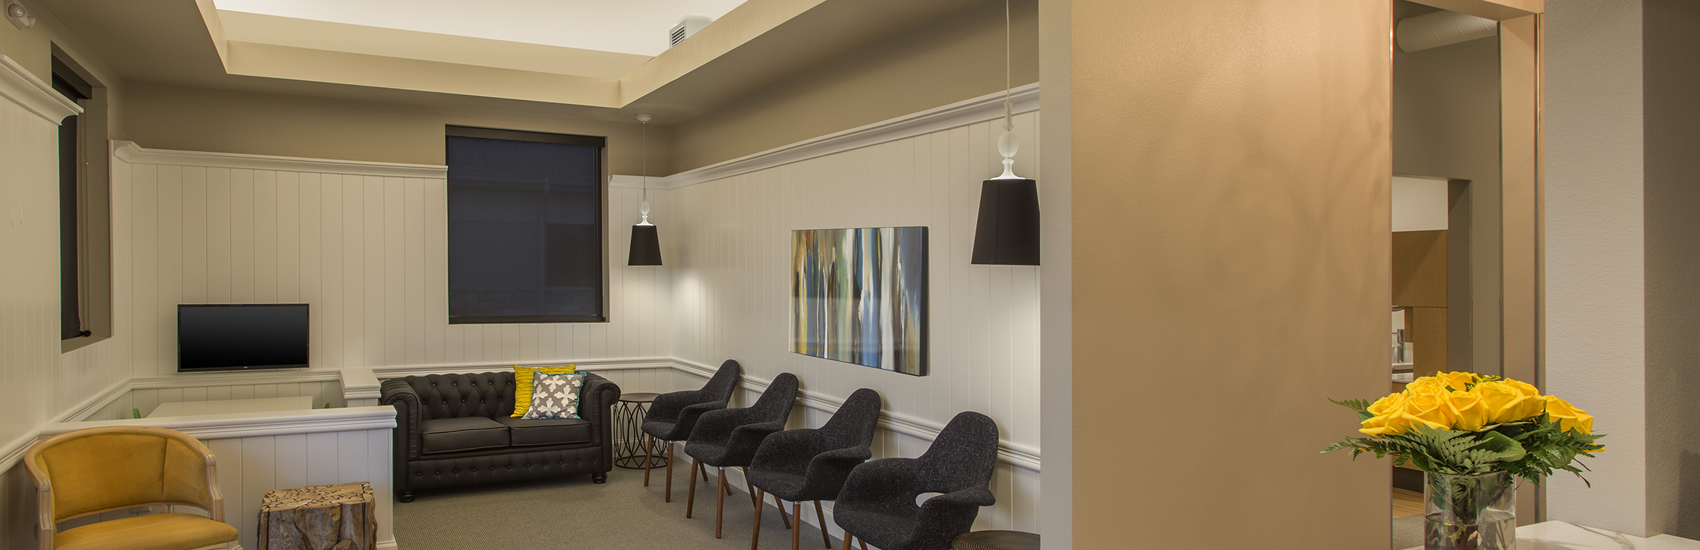 Eaton Family Dental Office Interior